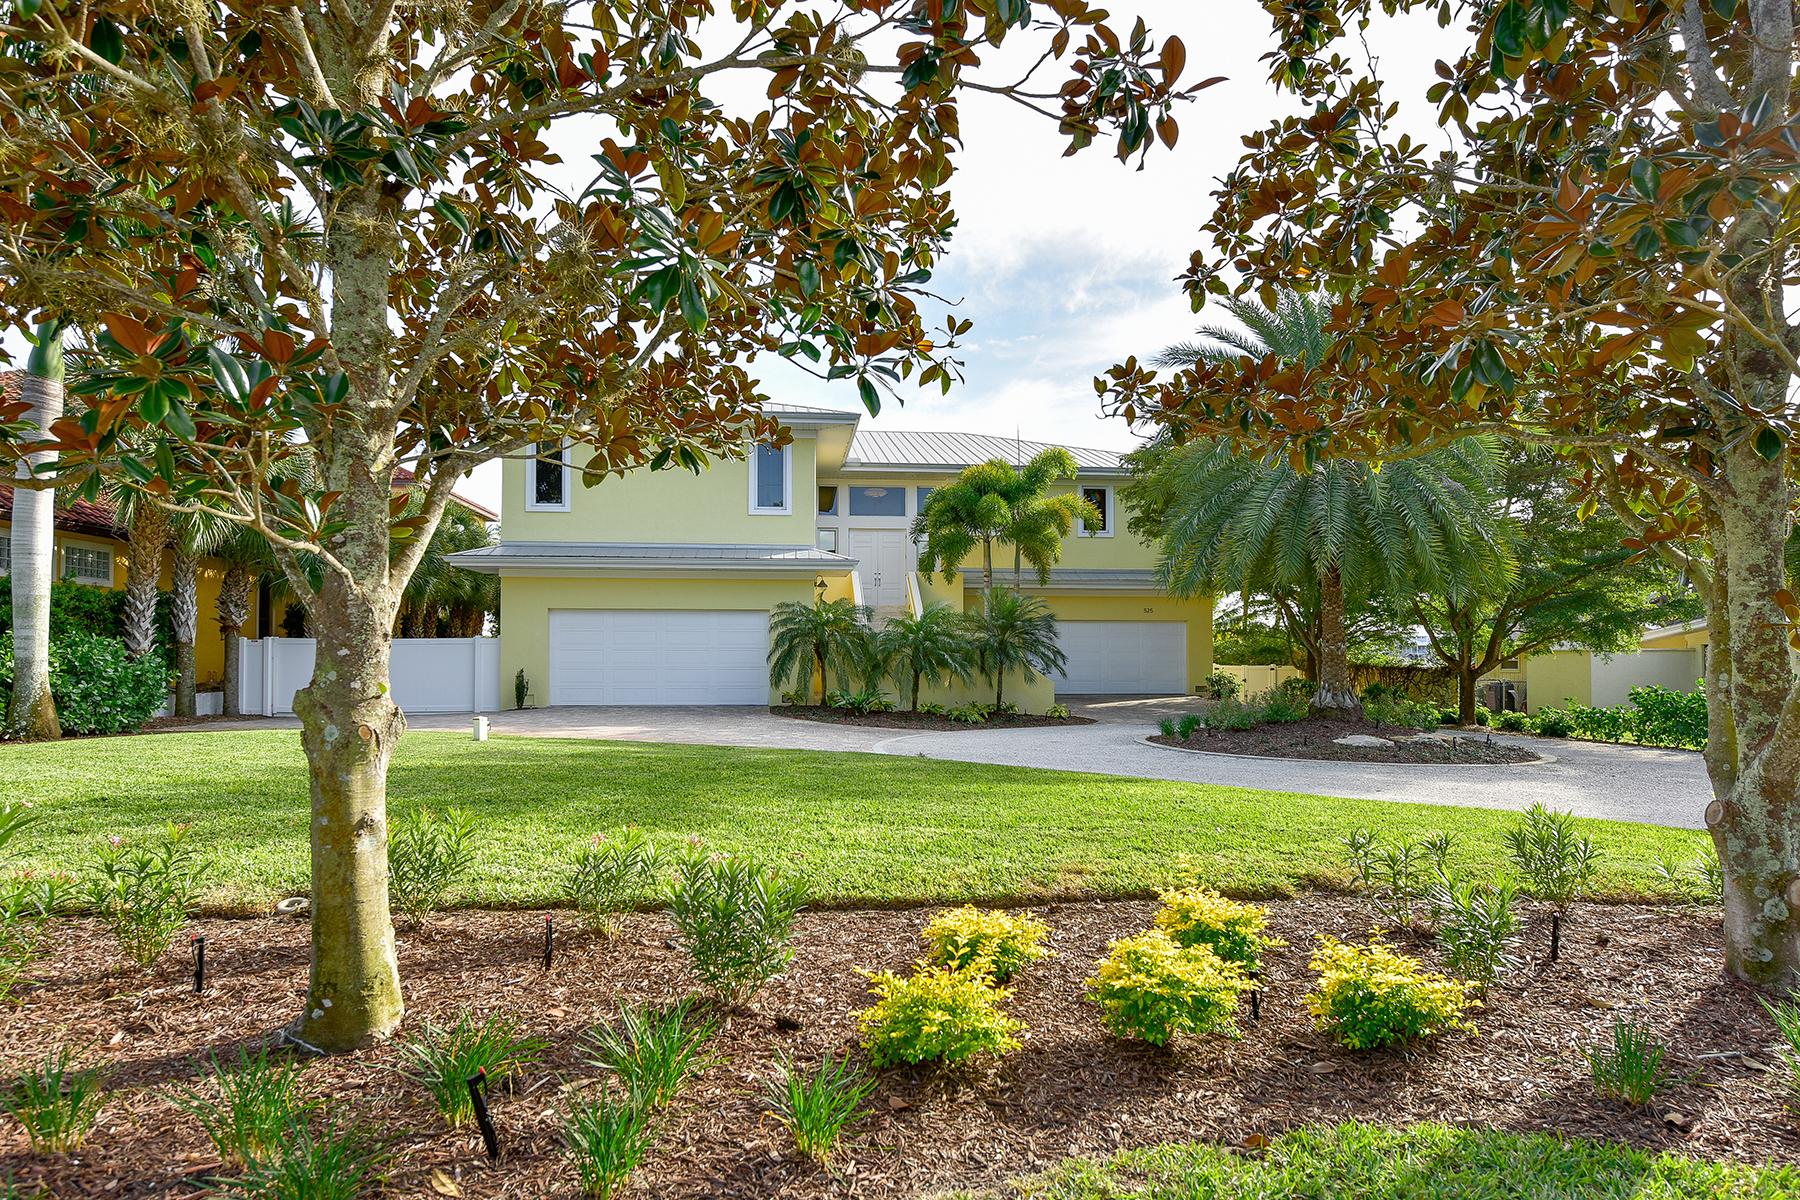 Villa per Vendita alle ore BAY POINT 525 Bayview Pkwy Nokomis, Florida 34275 Stati Uniti